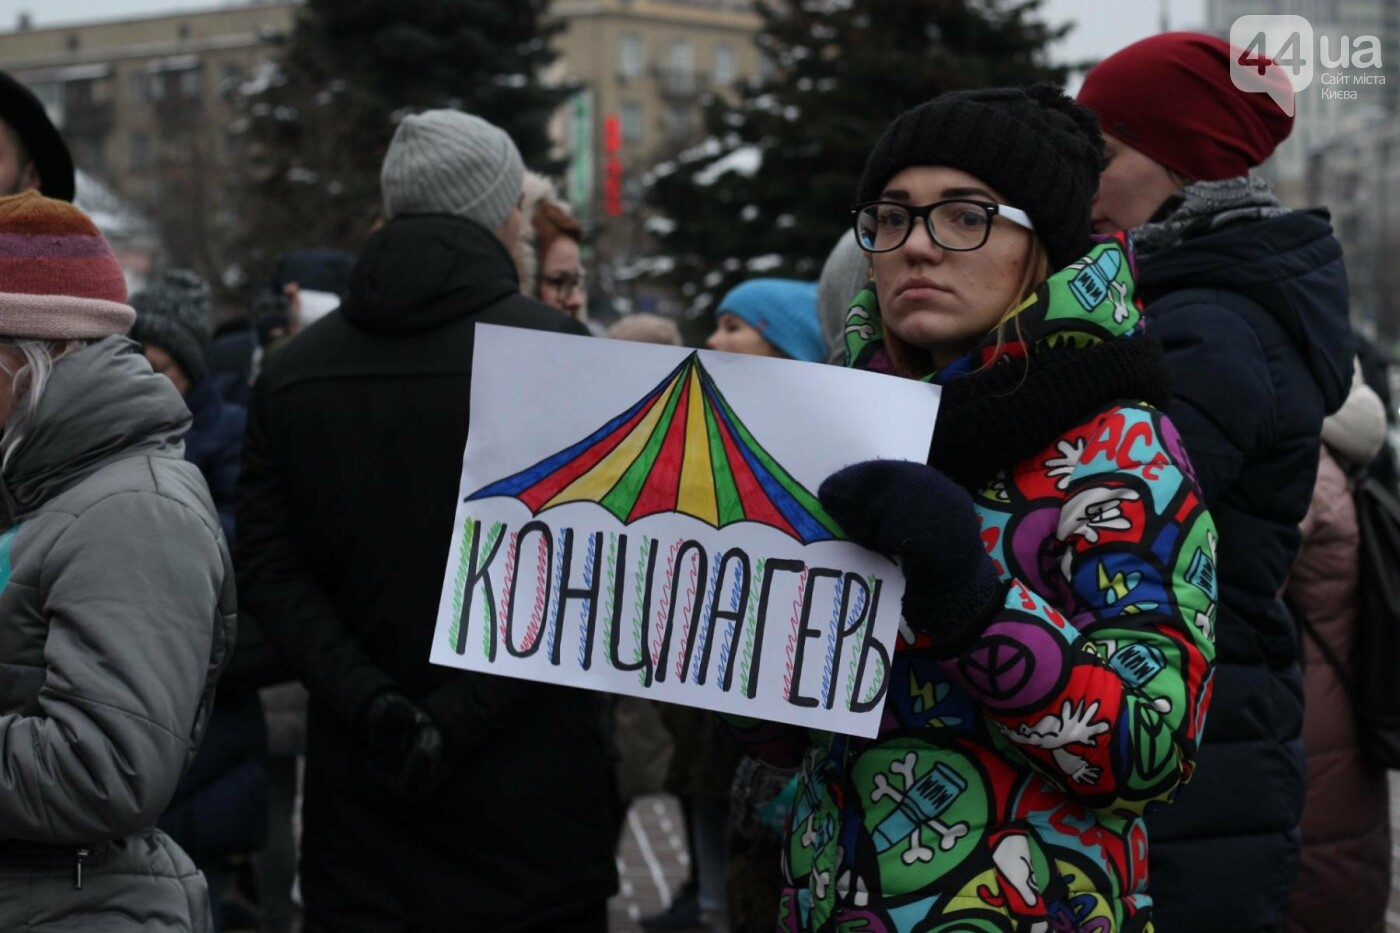 Цирк без животных: как в Киеве прошла акция протеста, фото-27